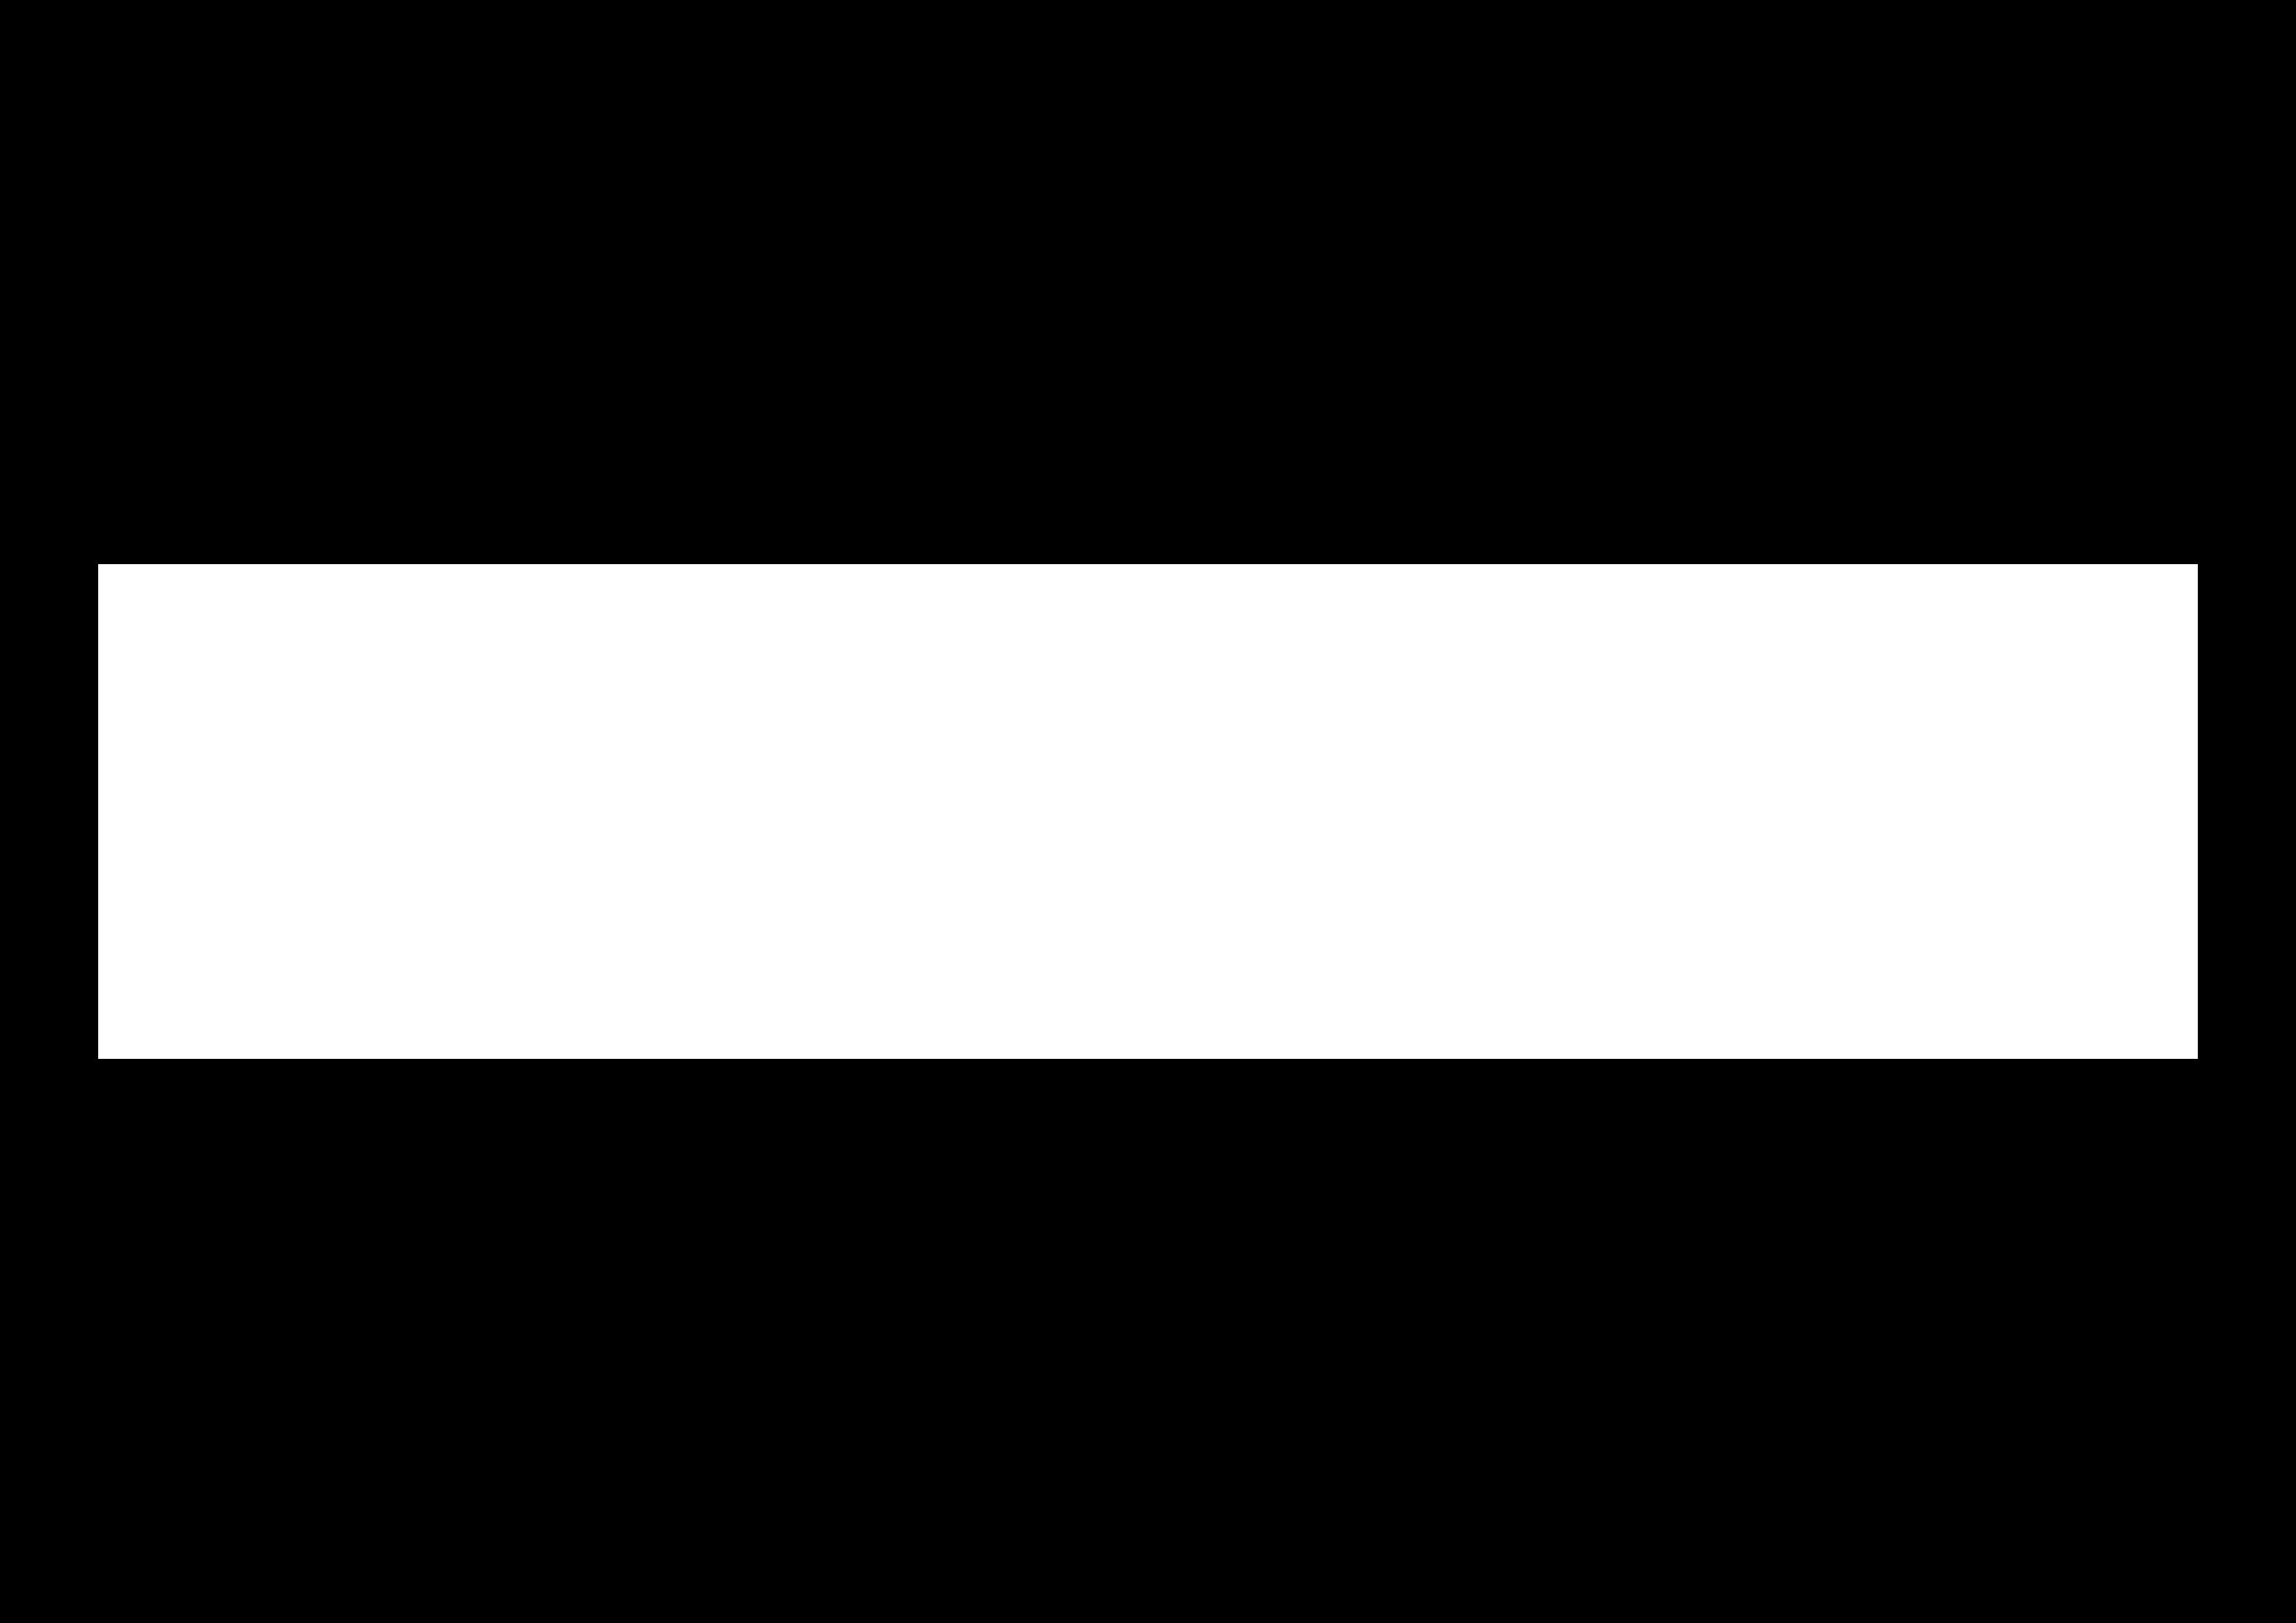 Ближе к телу: специальная съемка Louis Vuitton x BURO. (фото 24)